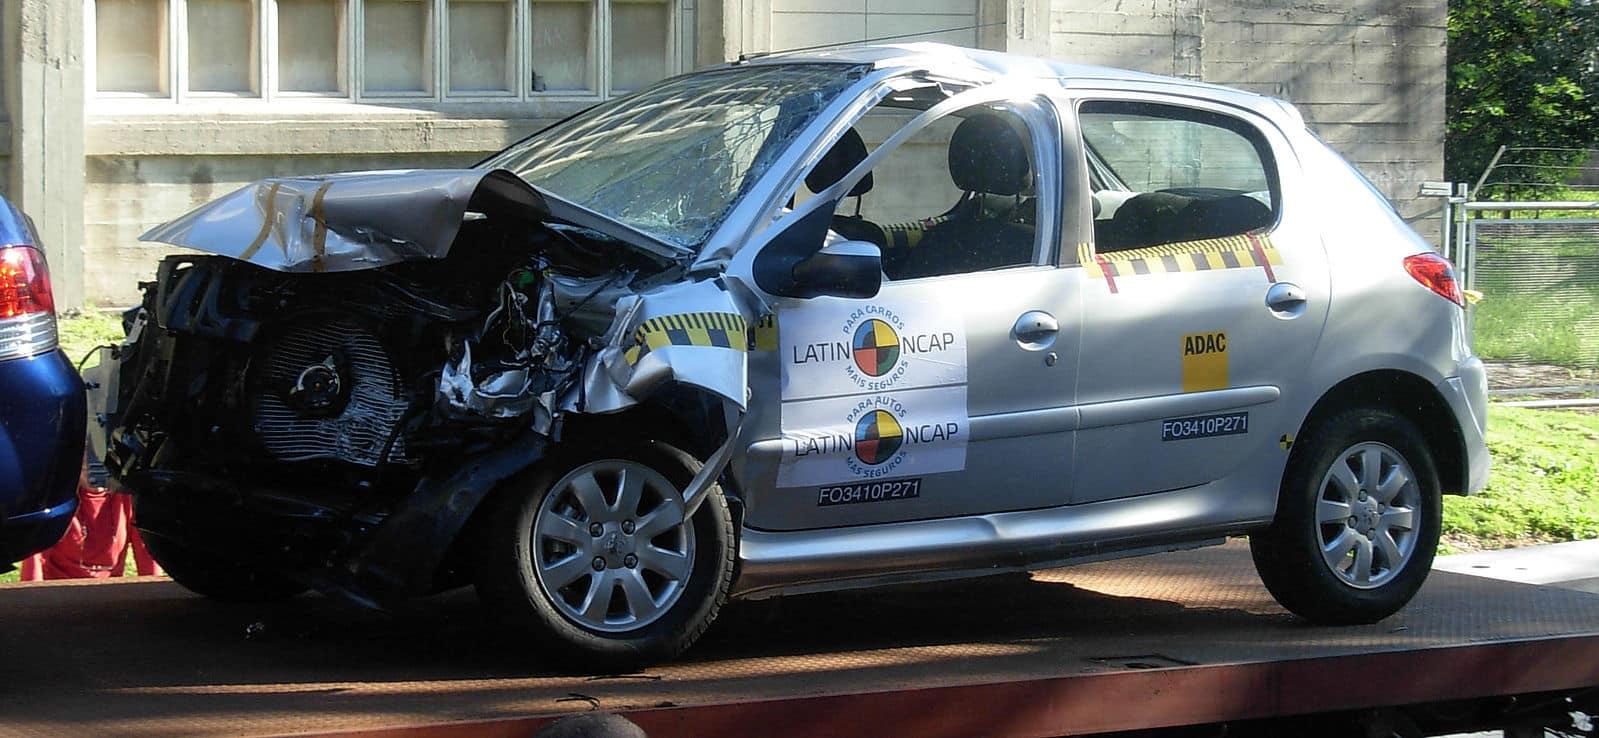 Choque de prueba Latin NCAP Uruguay